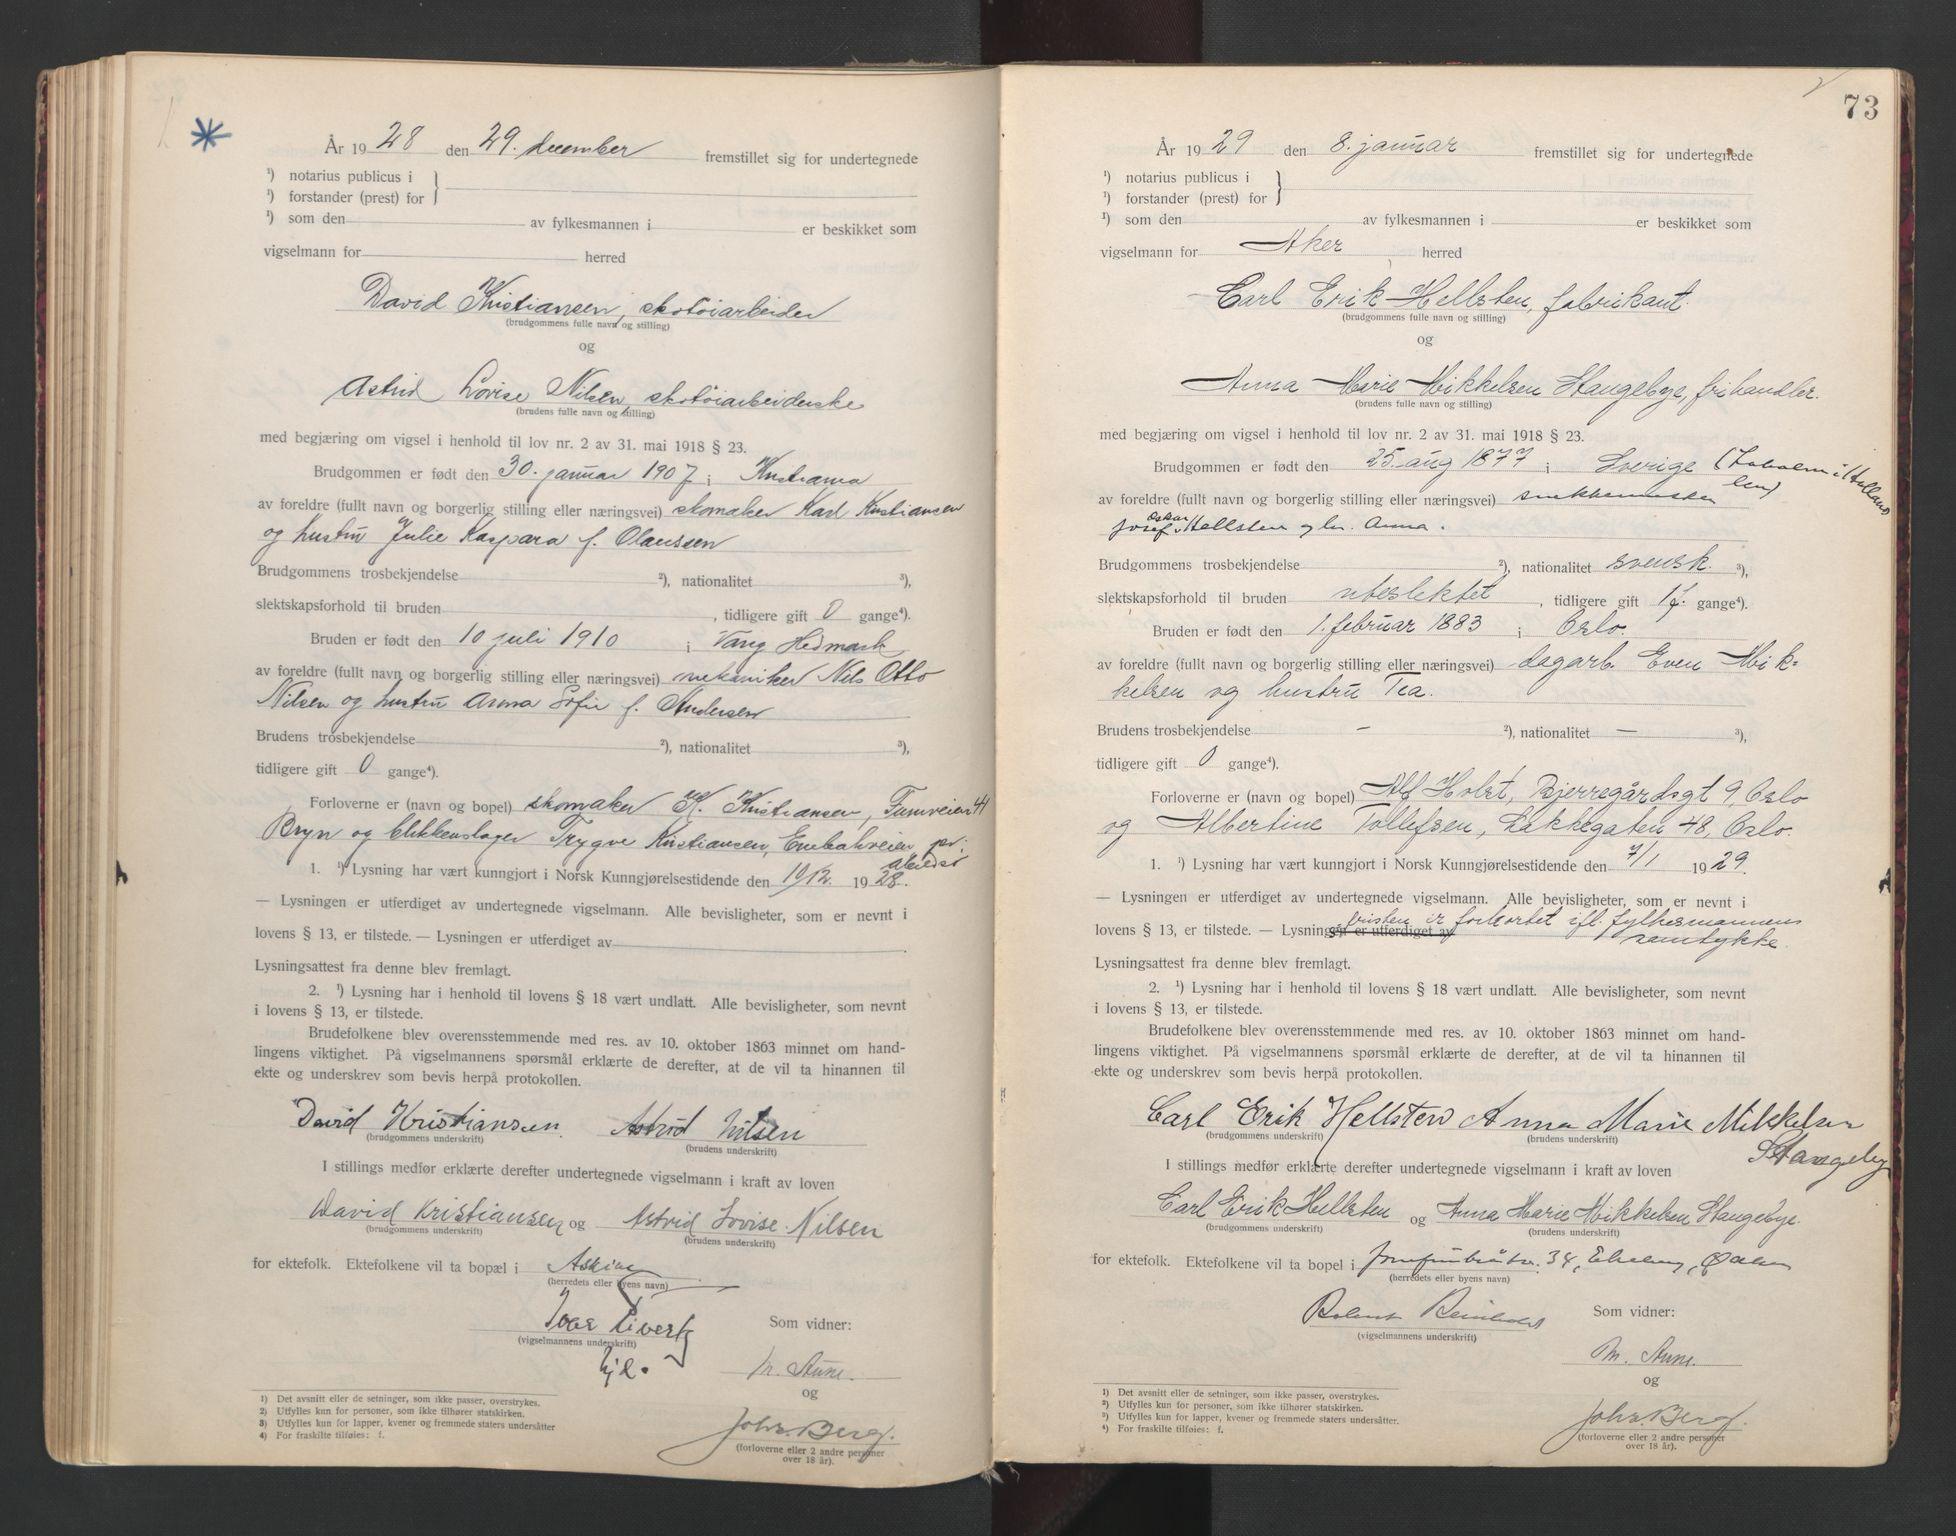 SAO, Aker sorenskriveri, L/Lc/Lcb/L0004: Vigselprotokoll, 1927-1929, s. 73